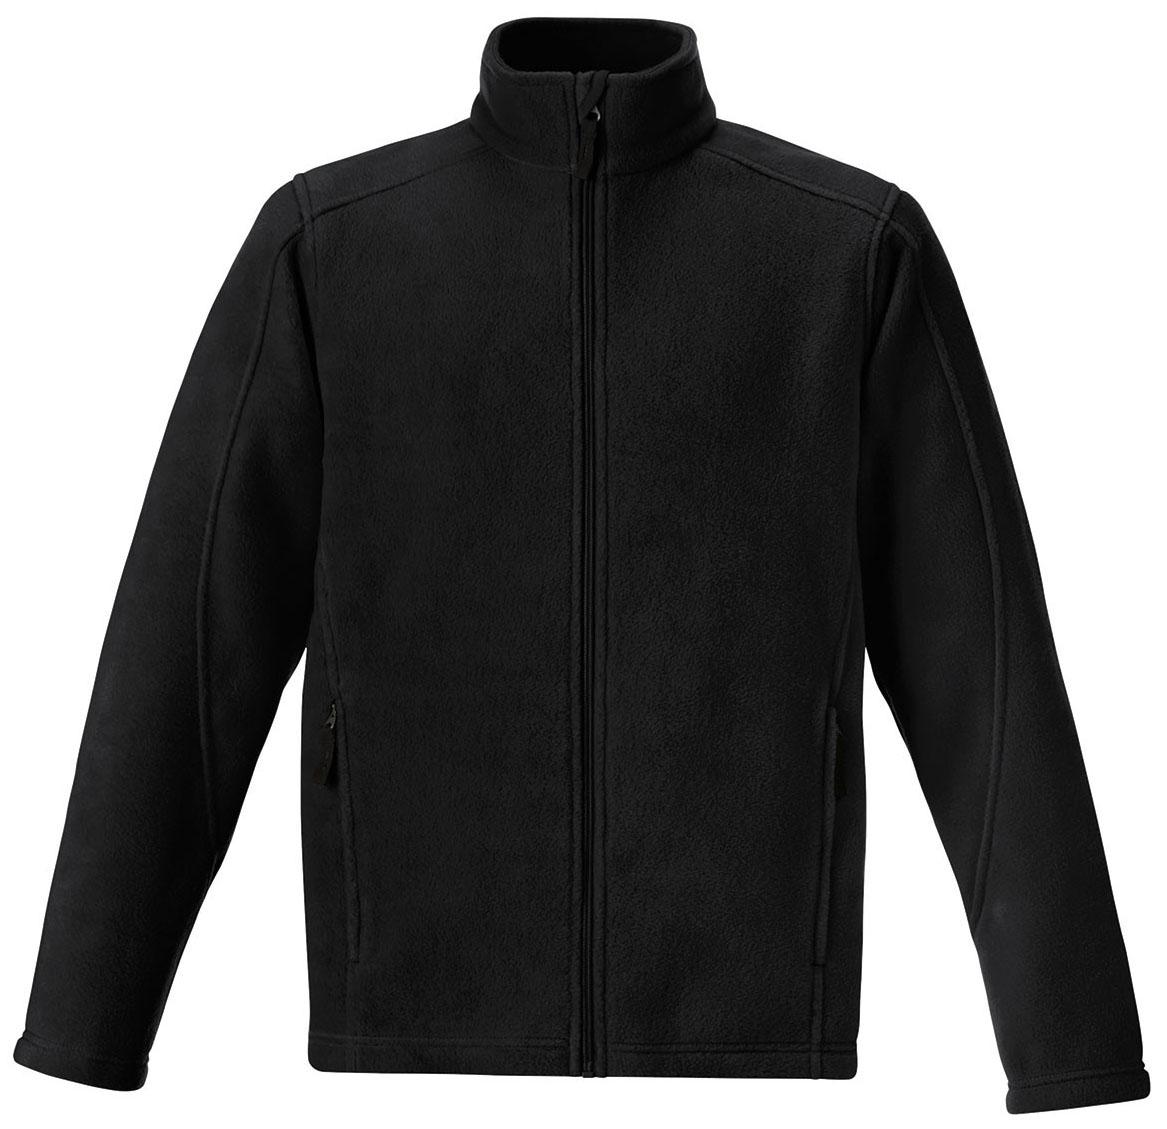 Picture of Core365 Tall Men's Fleece Jackets